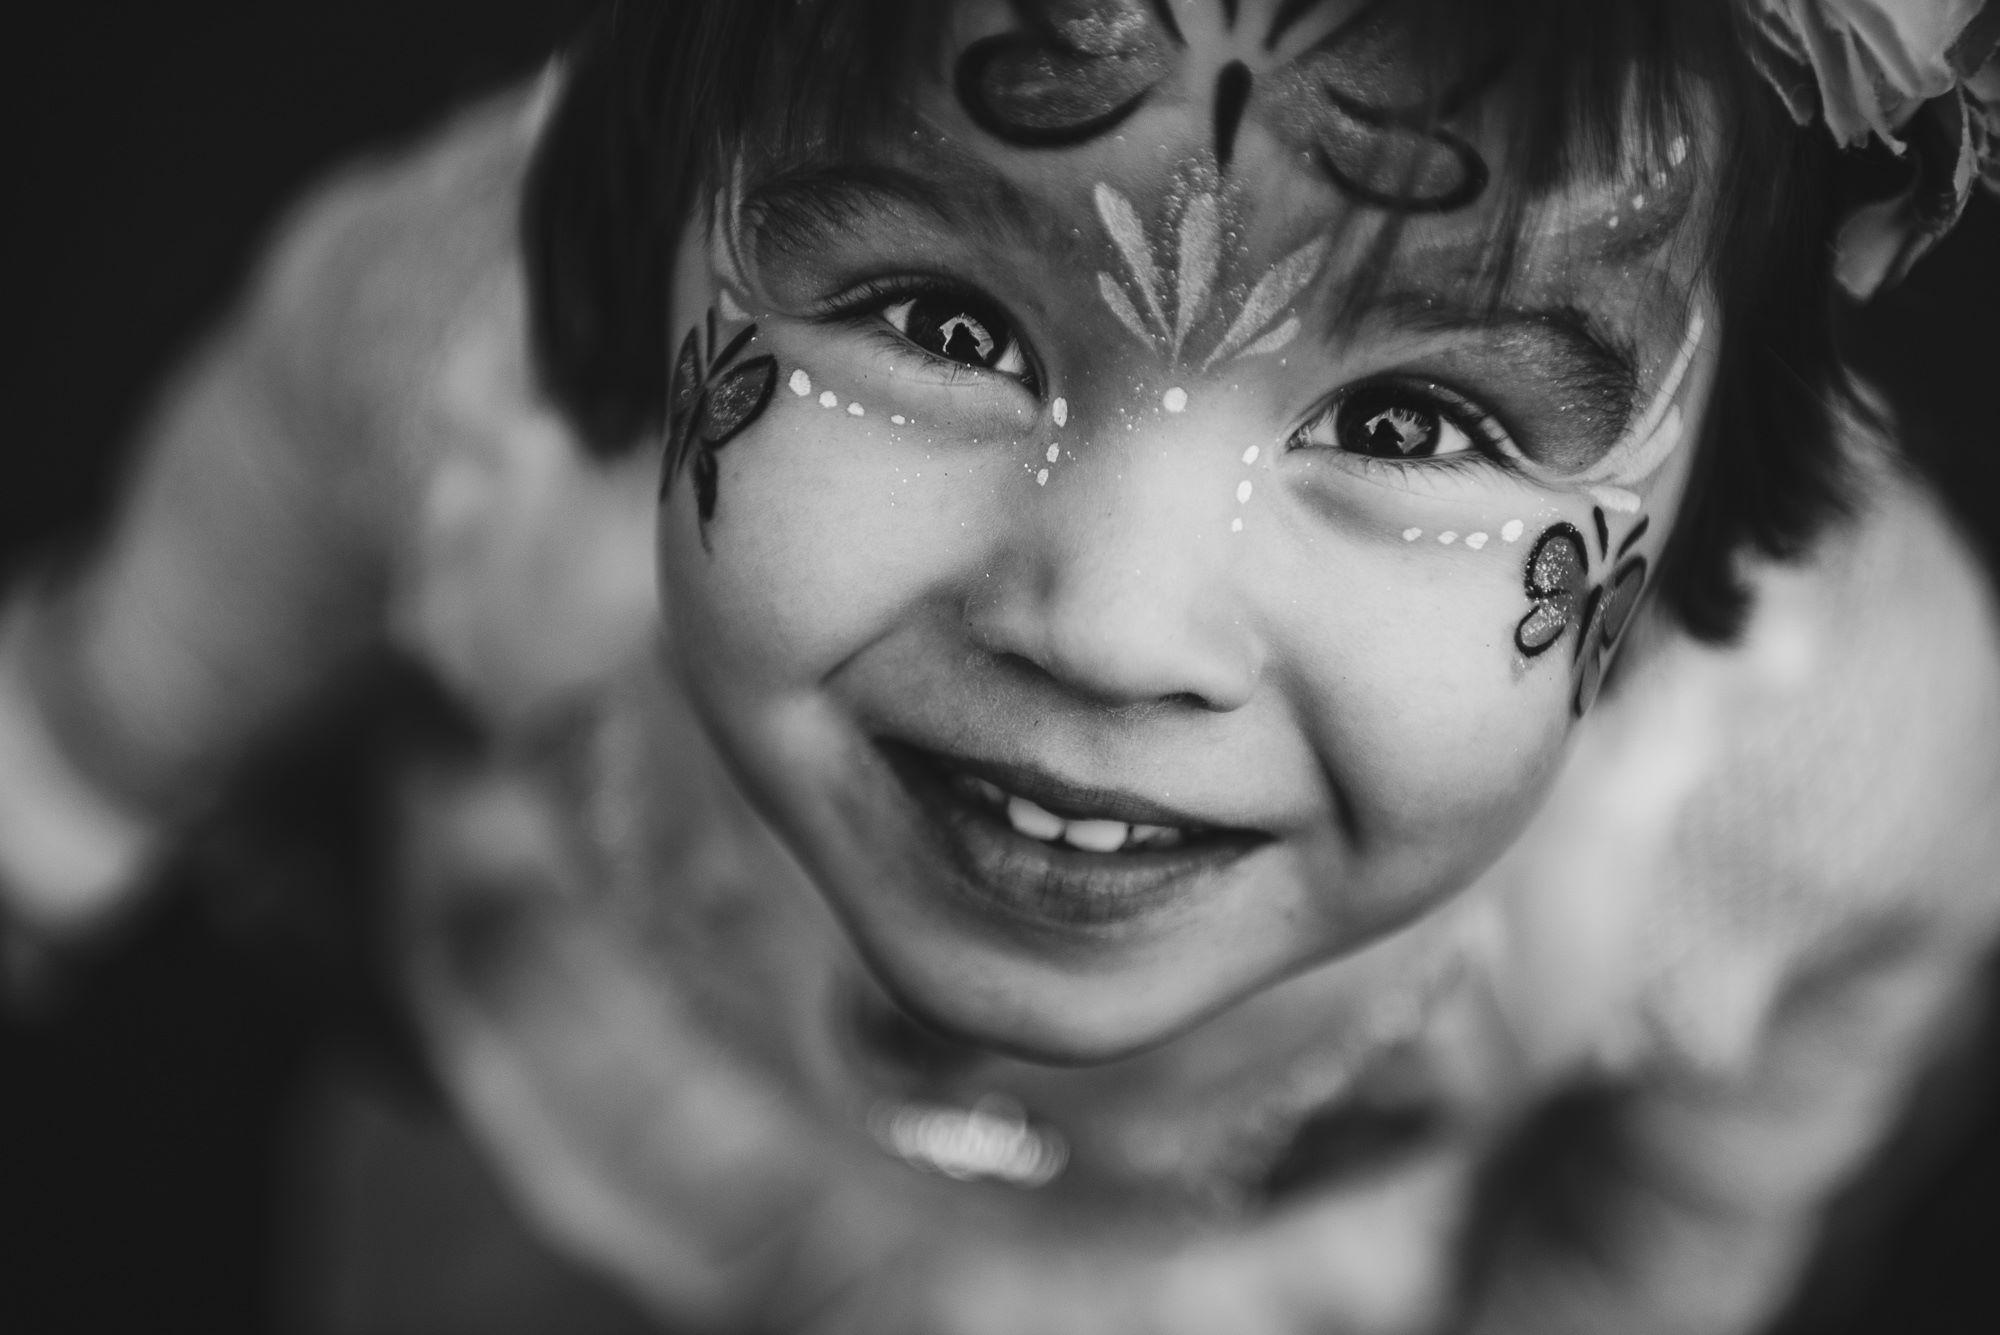 natalie marotta black and white child face paint emotive family photography posing